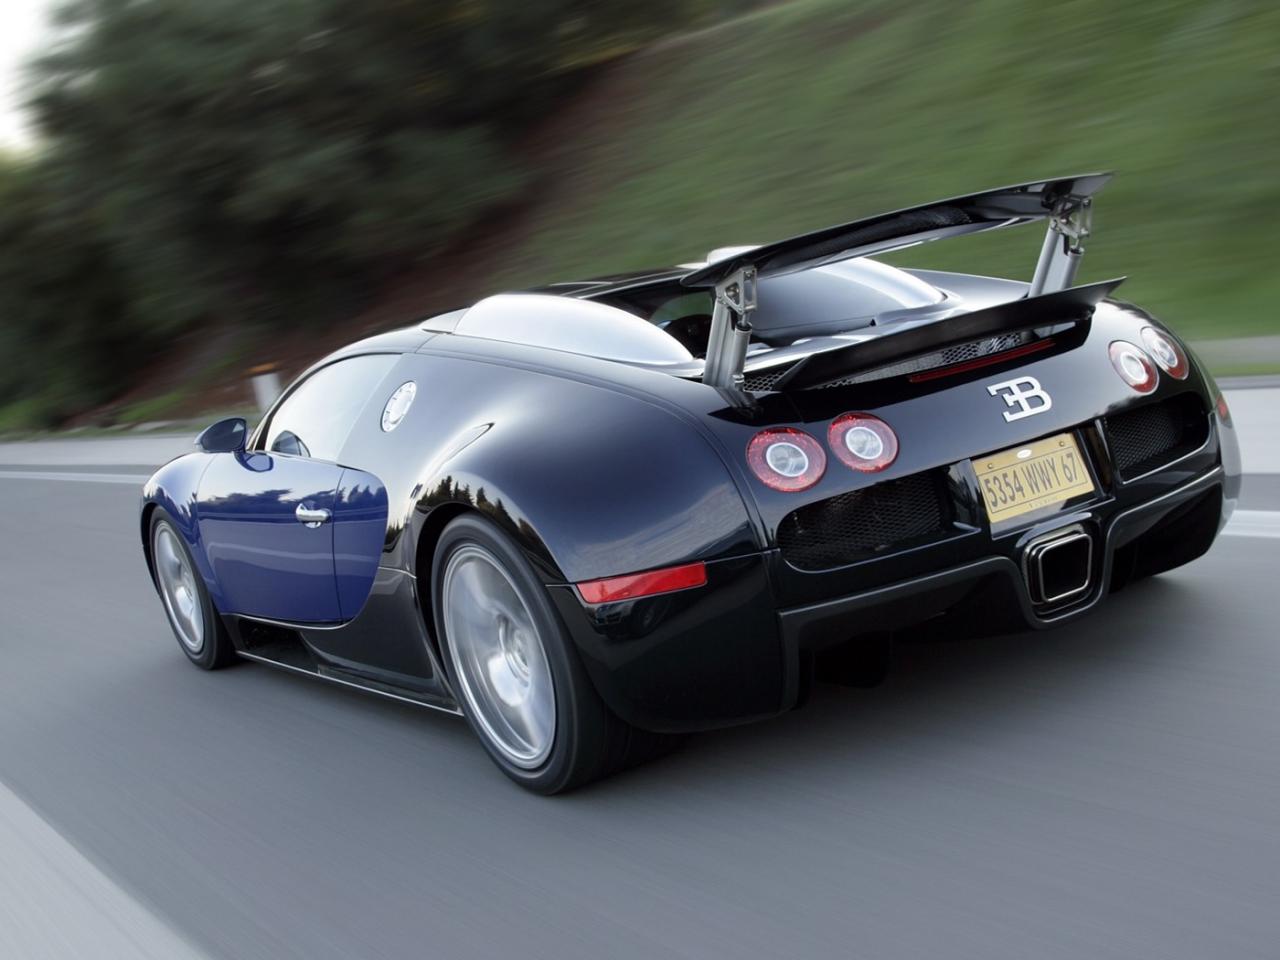 Bugatti Veyron en la carretera - 1280x960